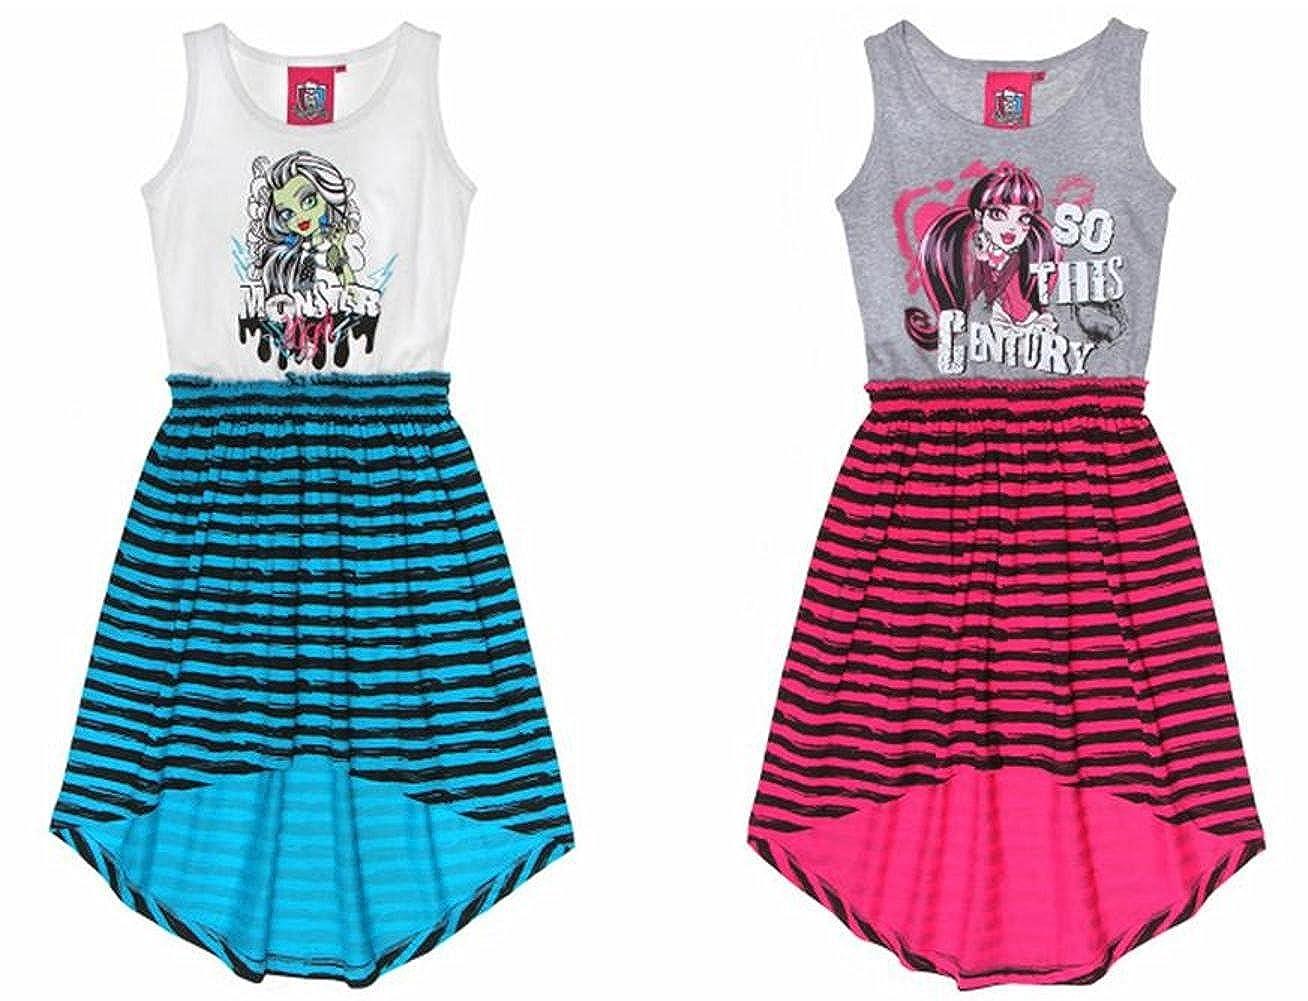 Mattel Monster High Monster High Kleid 2014 Kollektion 122